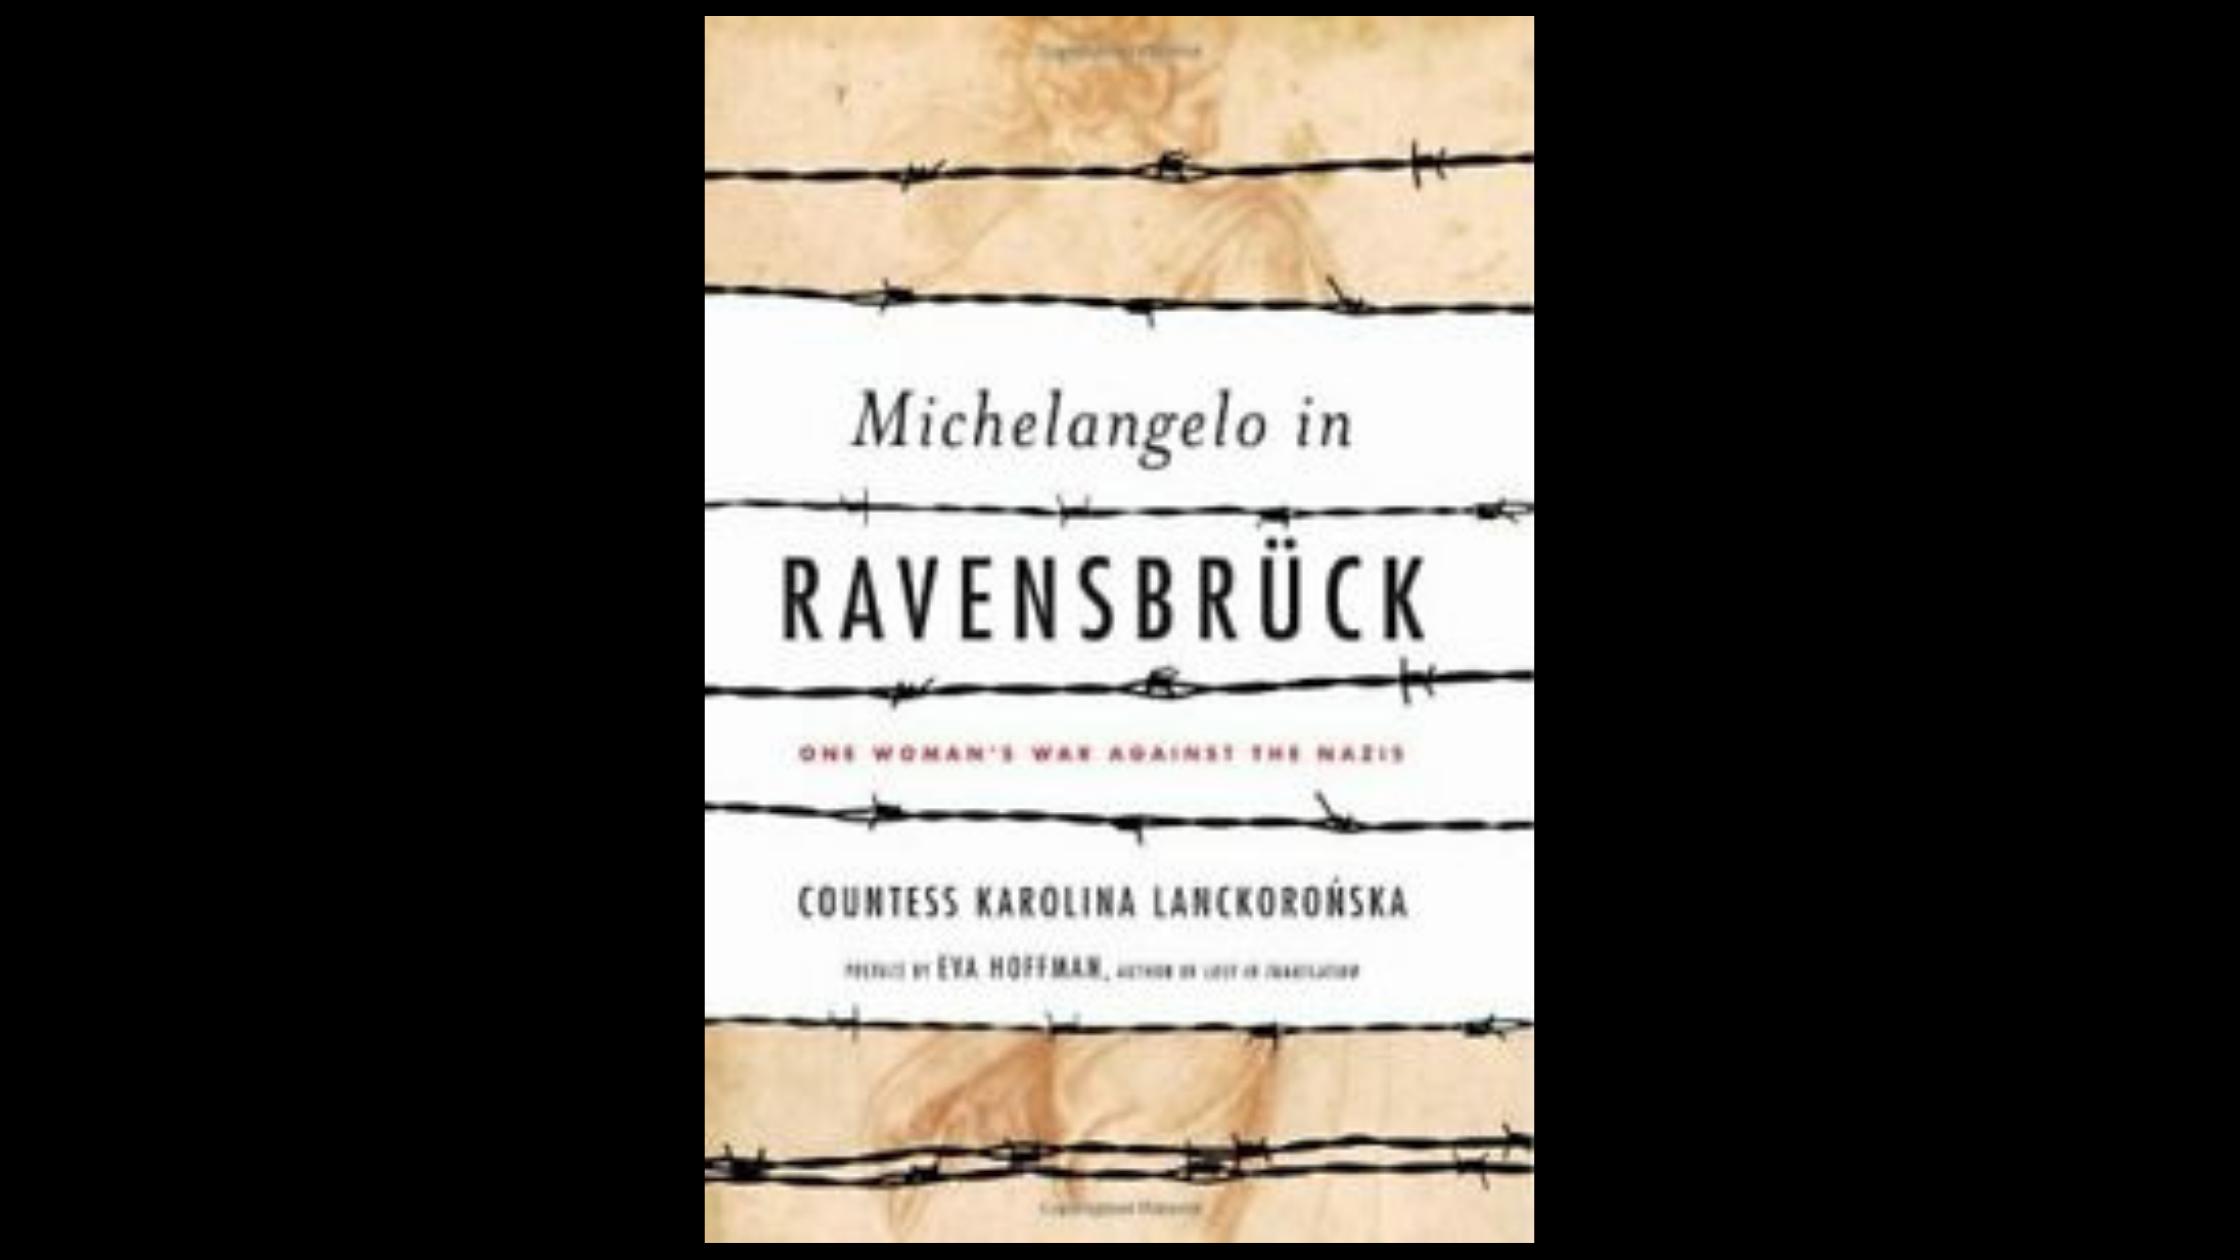 Book Review Of Duchess Karolina Lanckoronska's Book